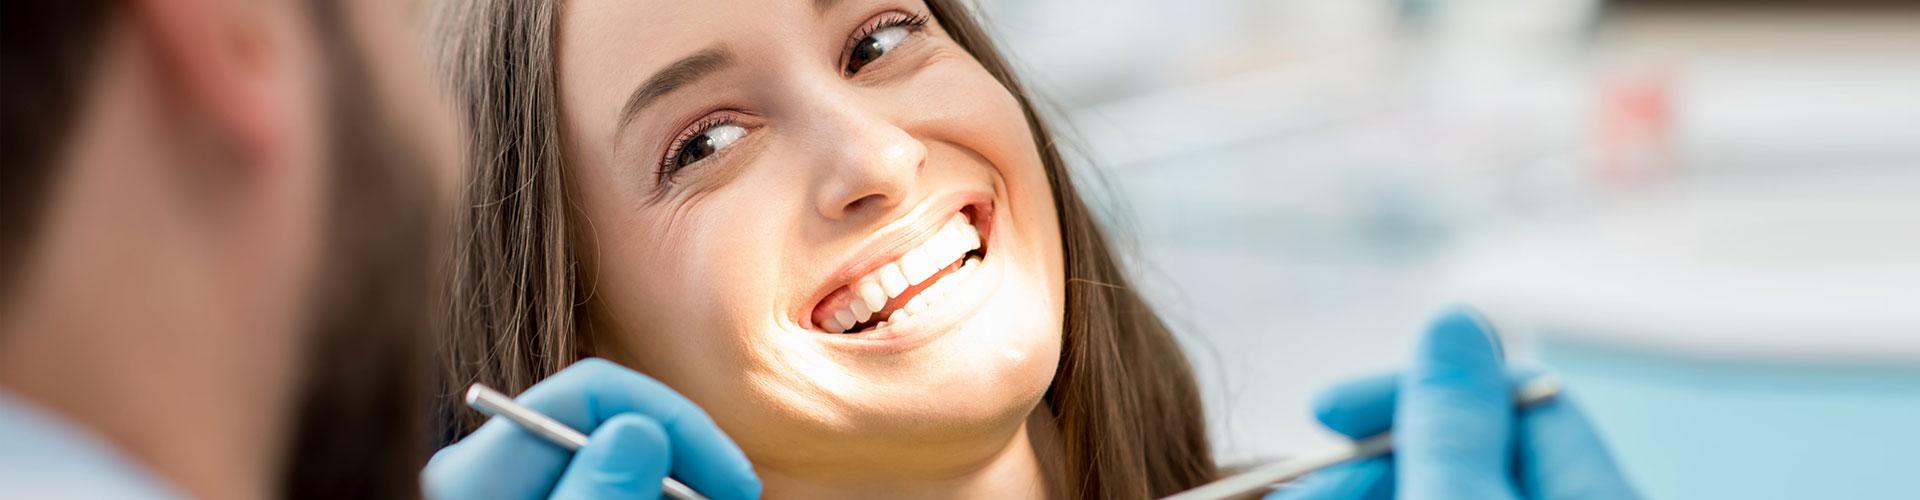 Dental Sealants Prevent Cavities